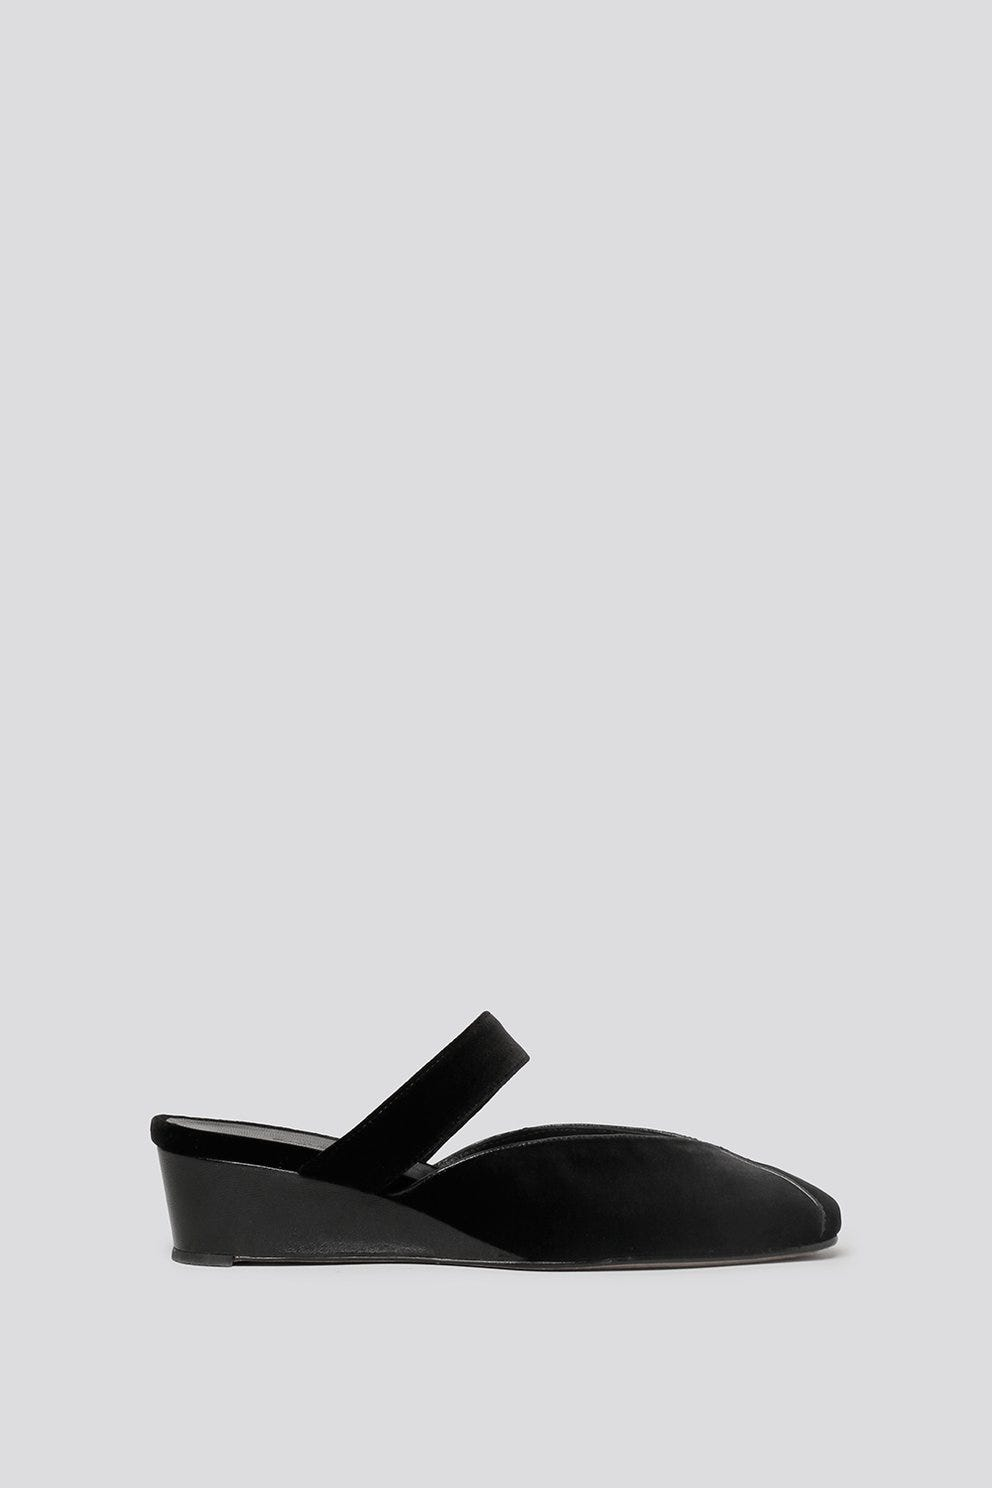 Stylish Women Sandals Summer For Shoes 2018 tQrCxsdh